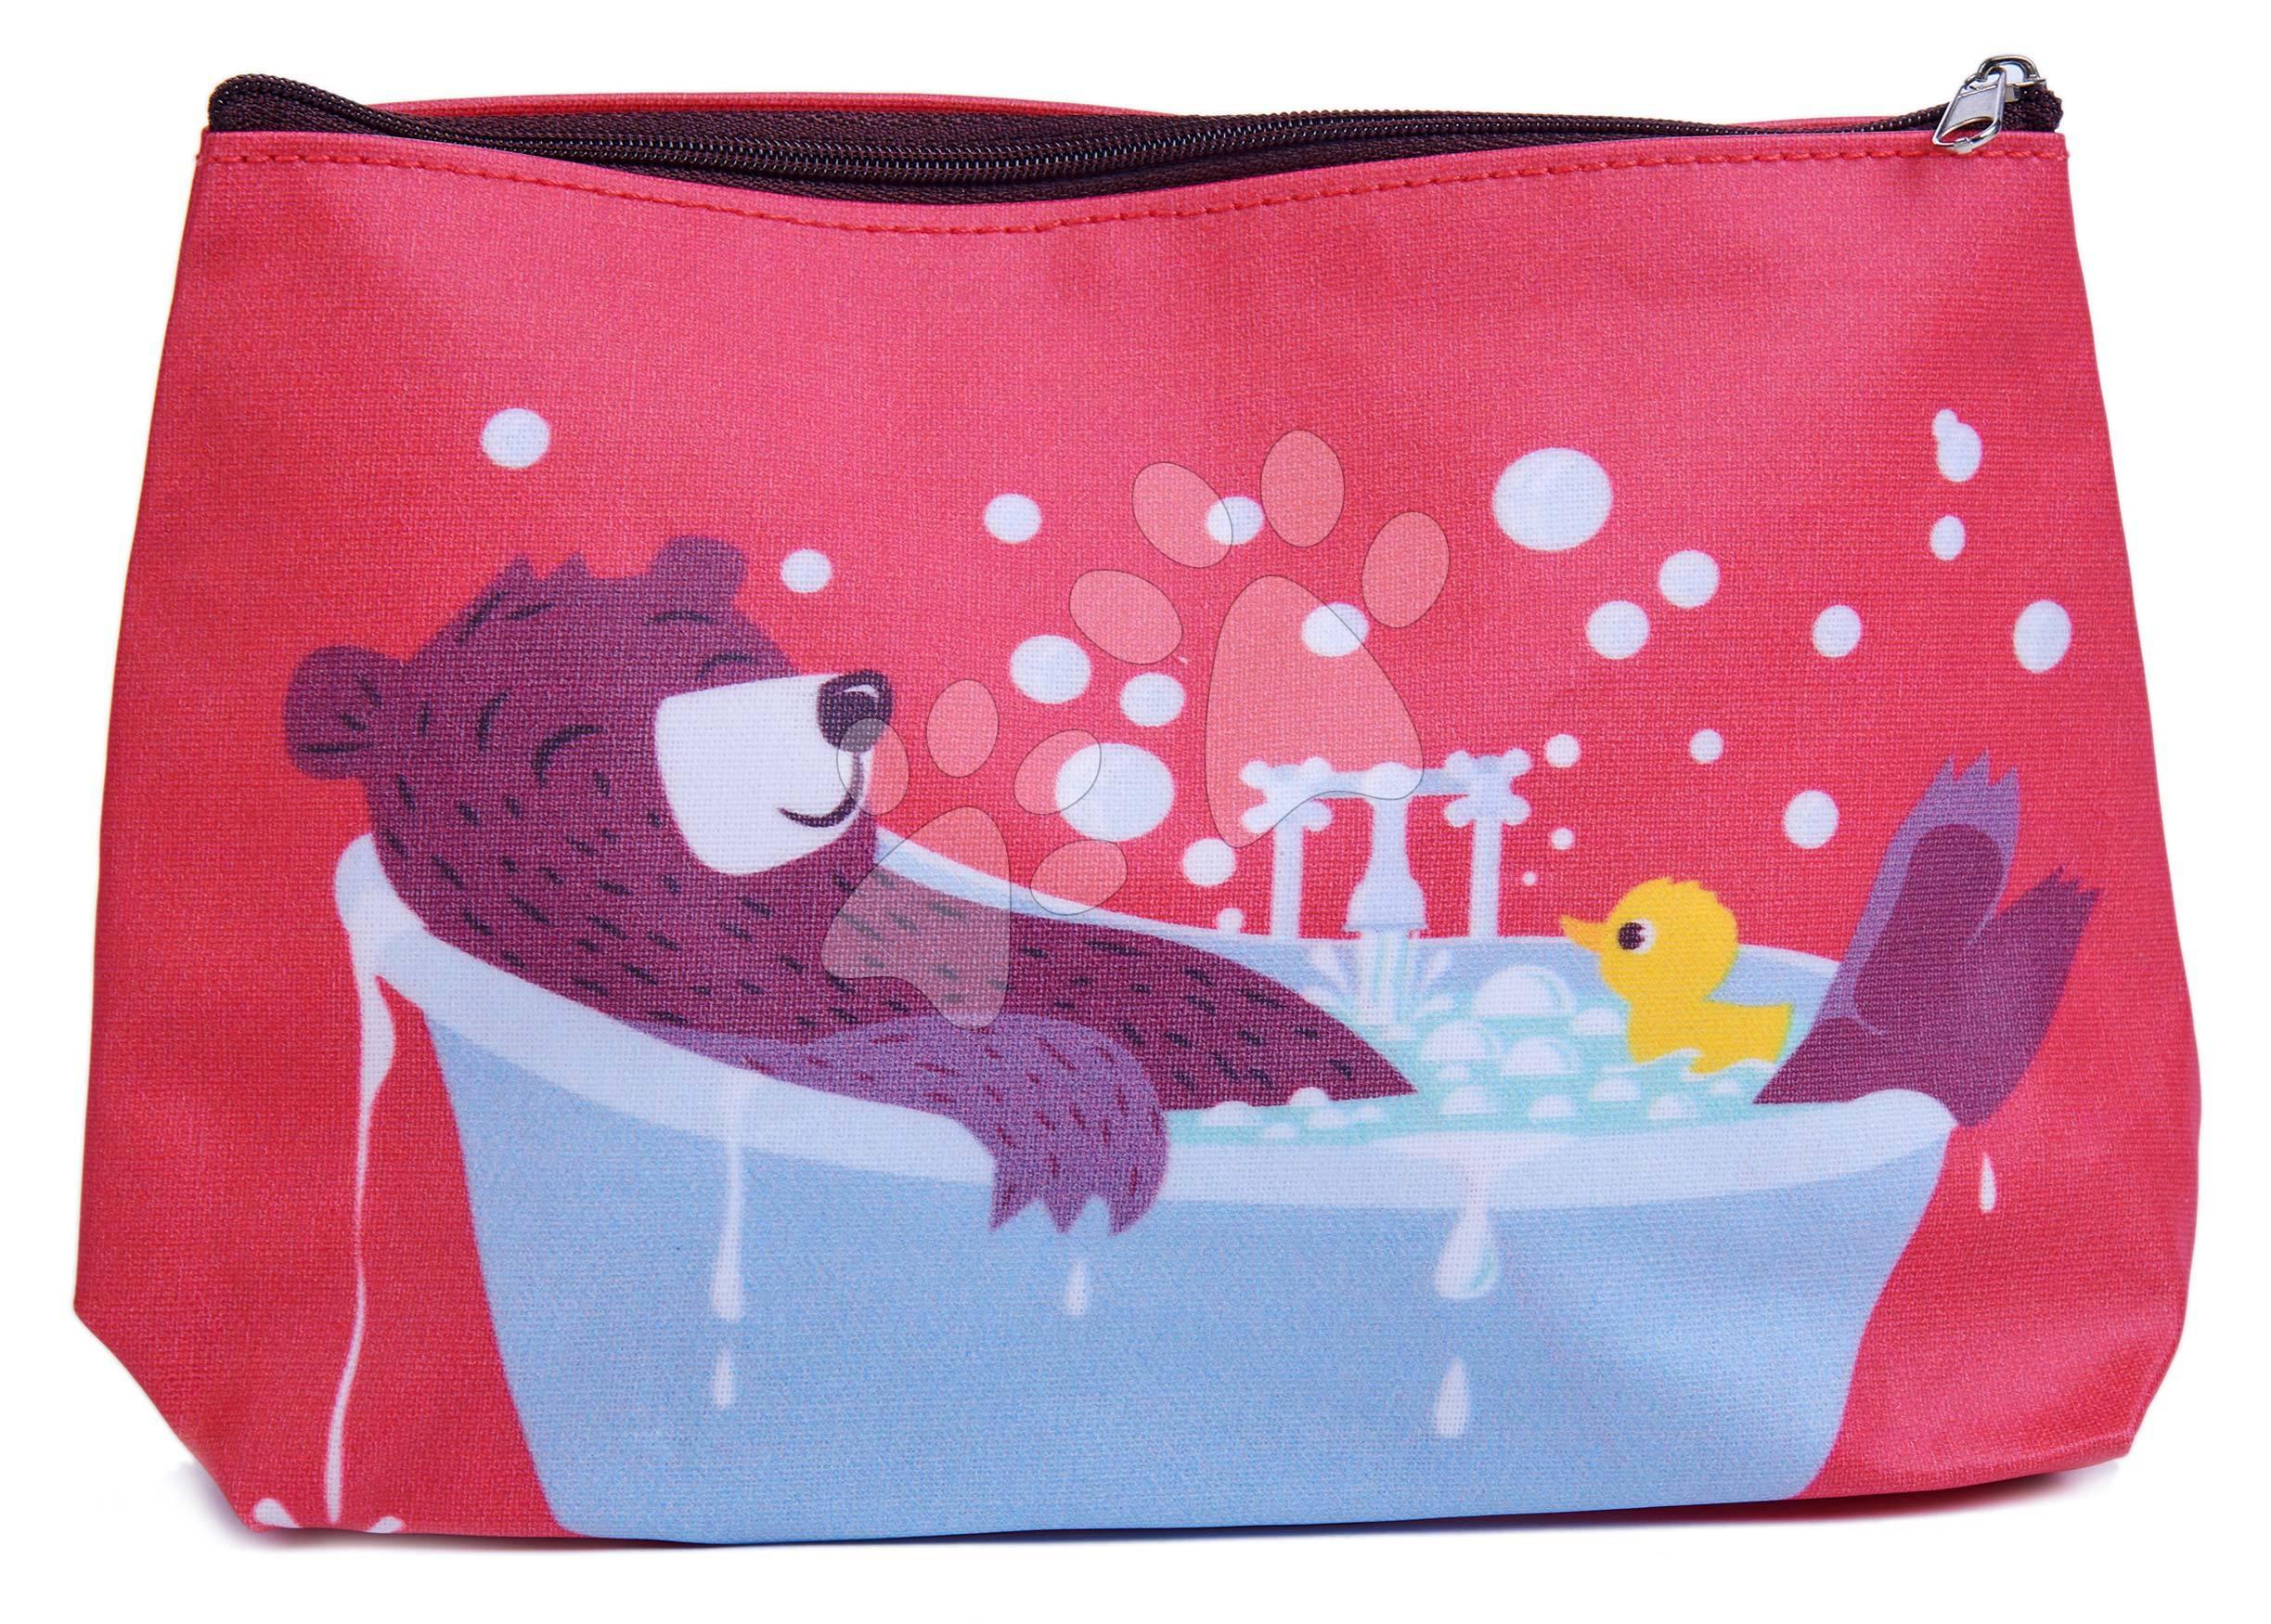 Toaletní taštička medvěd Fred's Washbag ThreadBear z bavlny